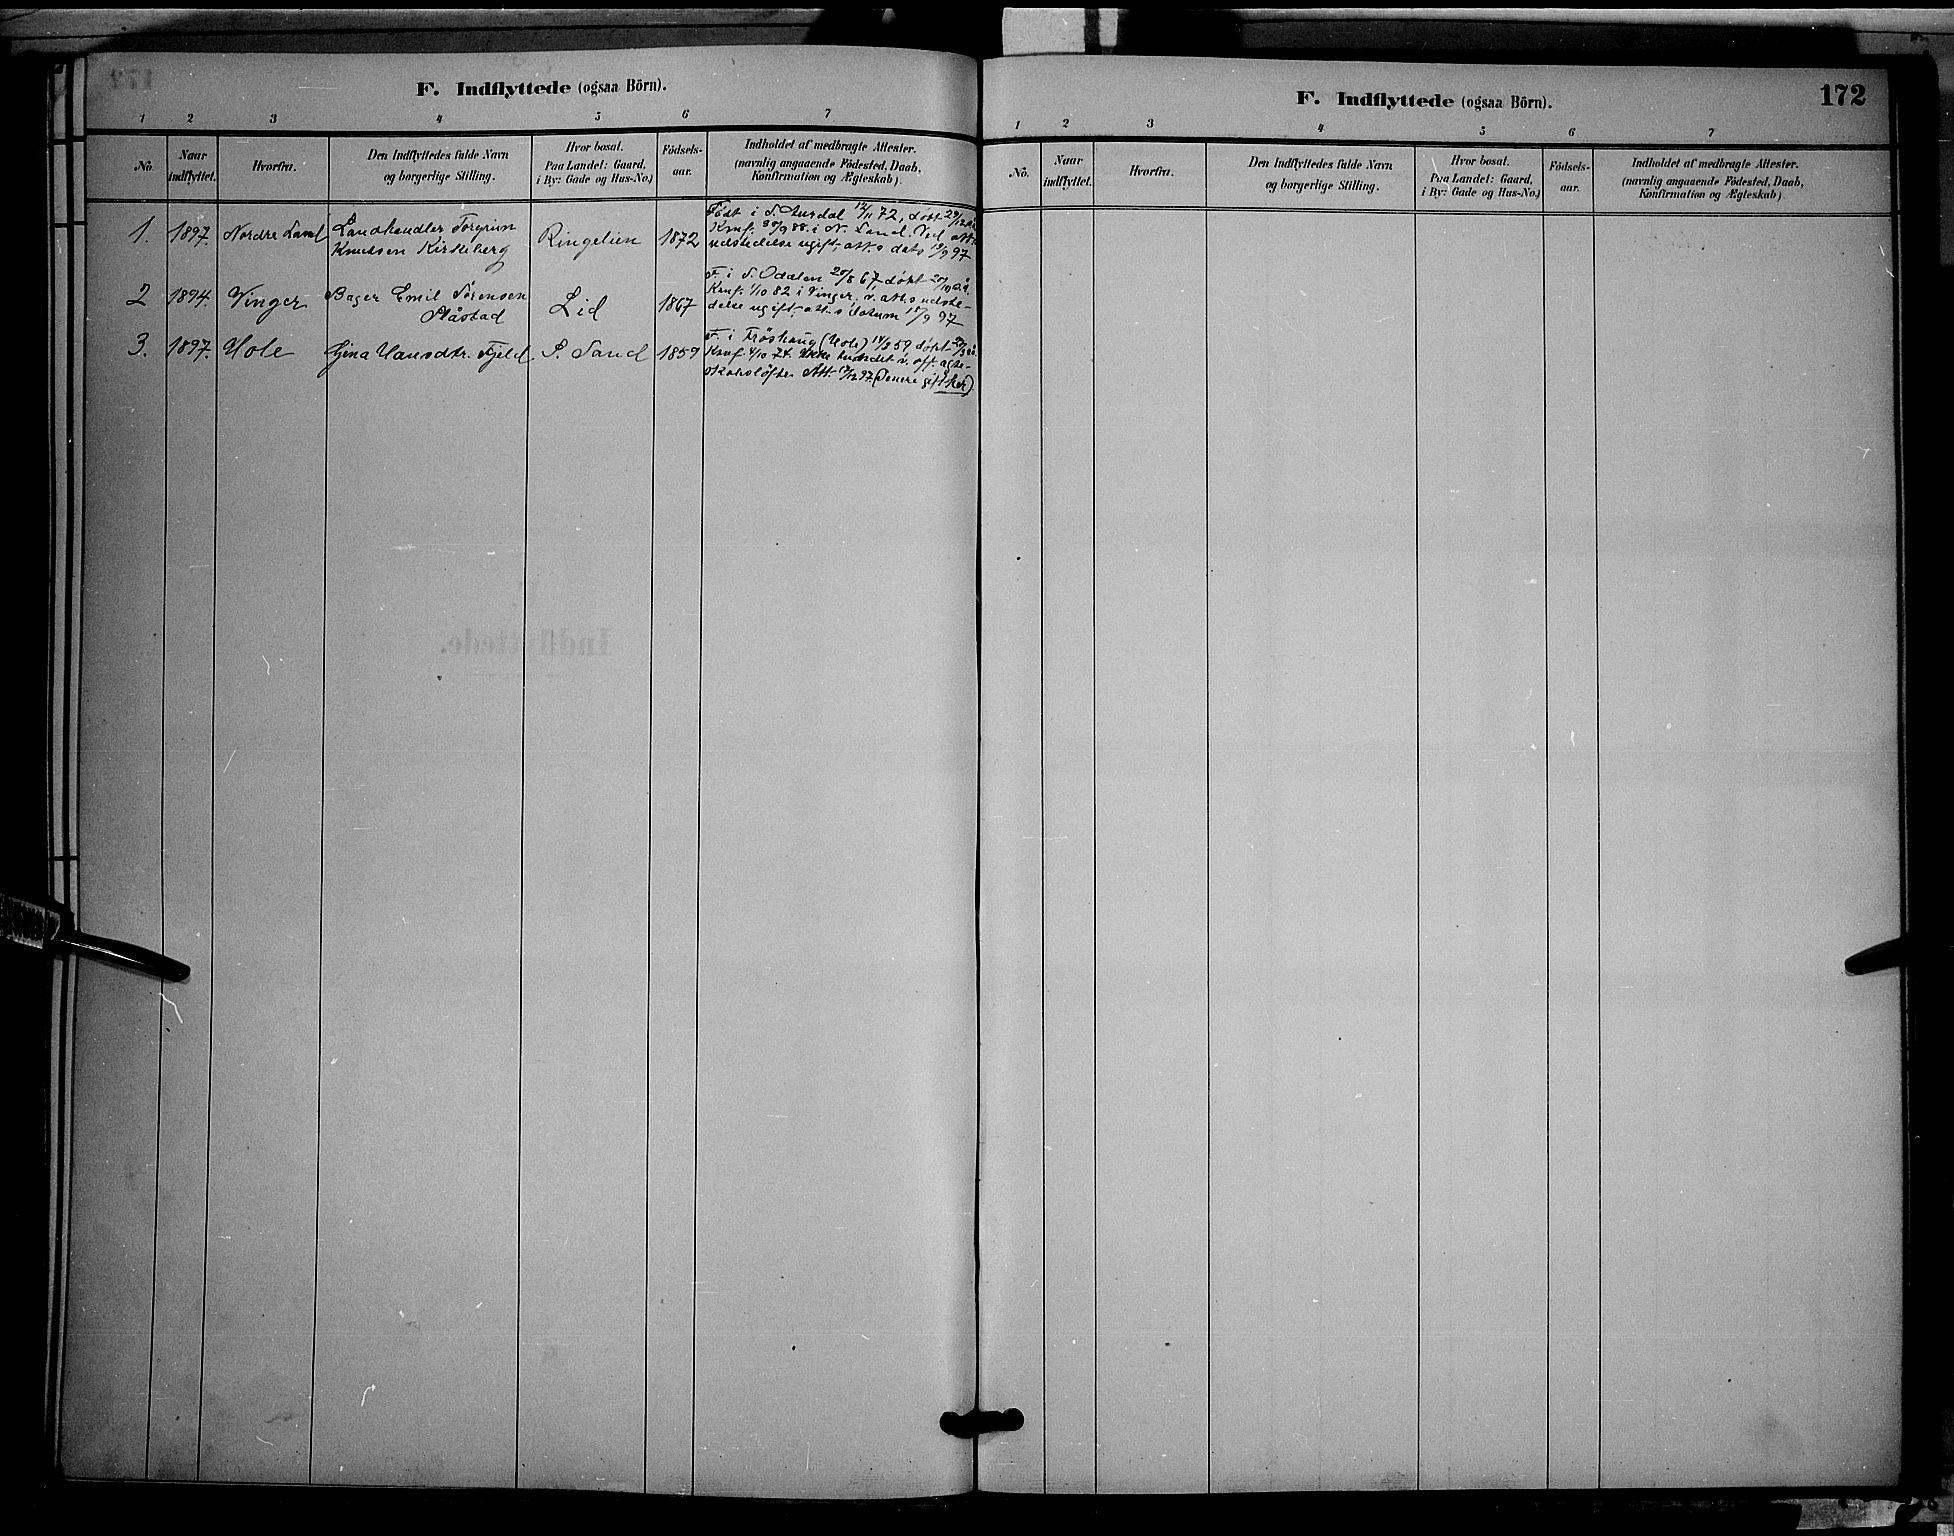 SAH, Søndre Land prestekontor, L/L0002: Klokkerbok nr. 2, 1884-1900, s. 172